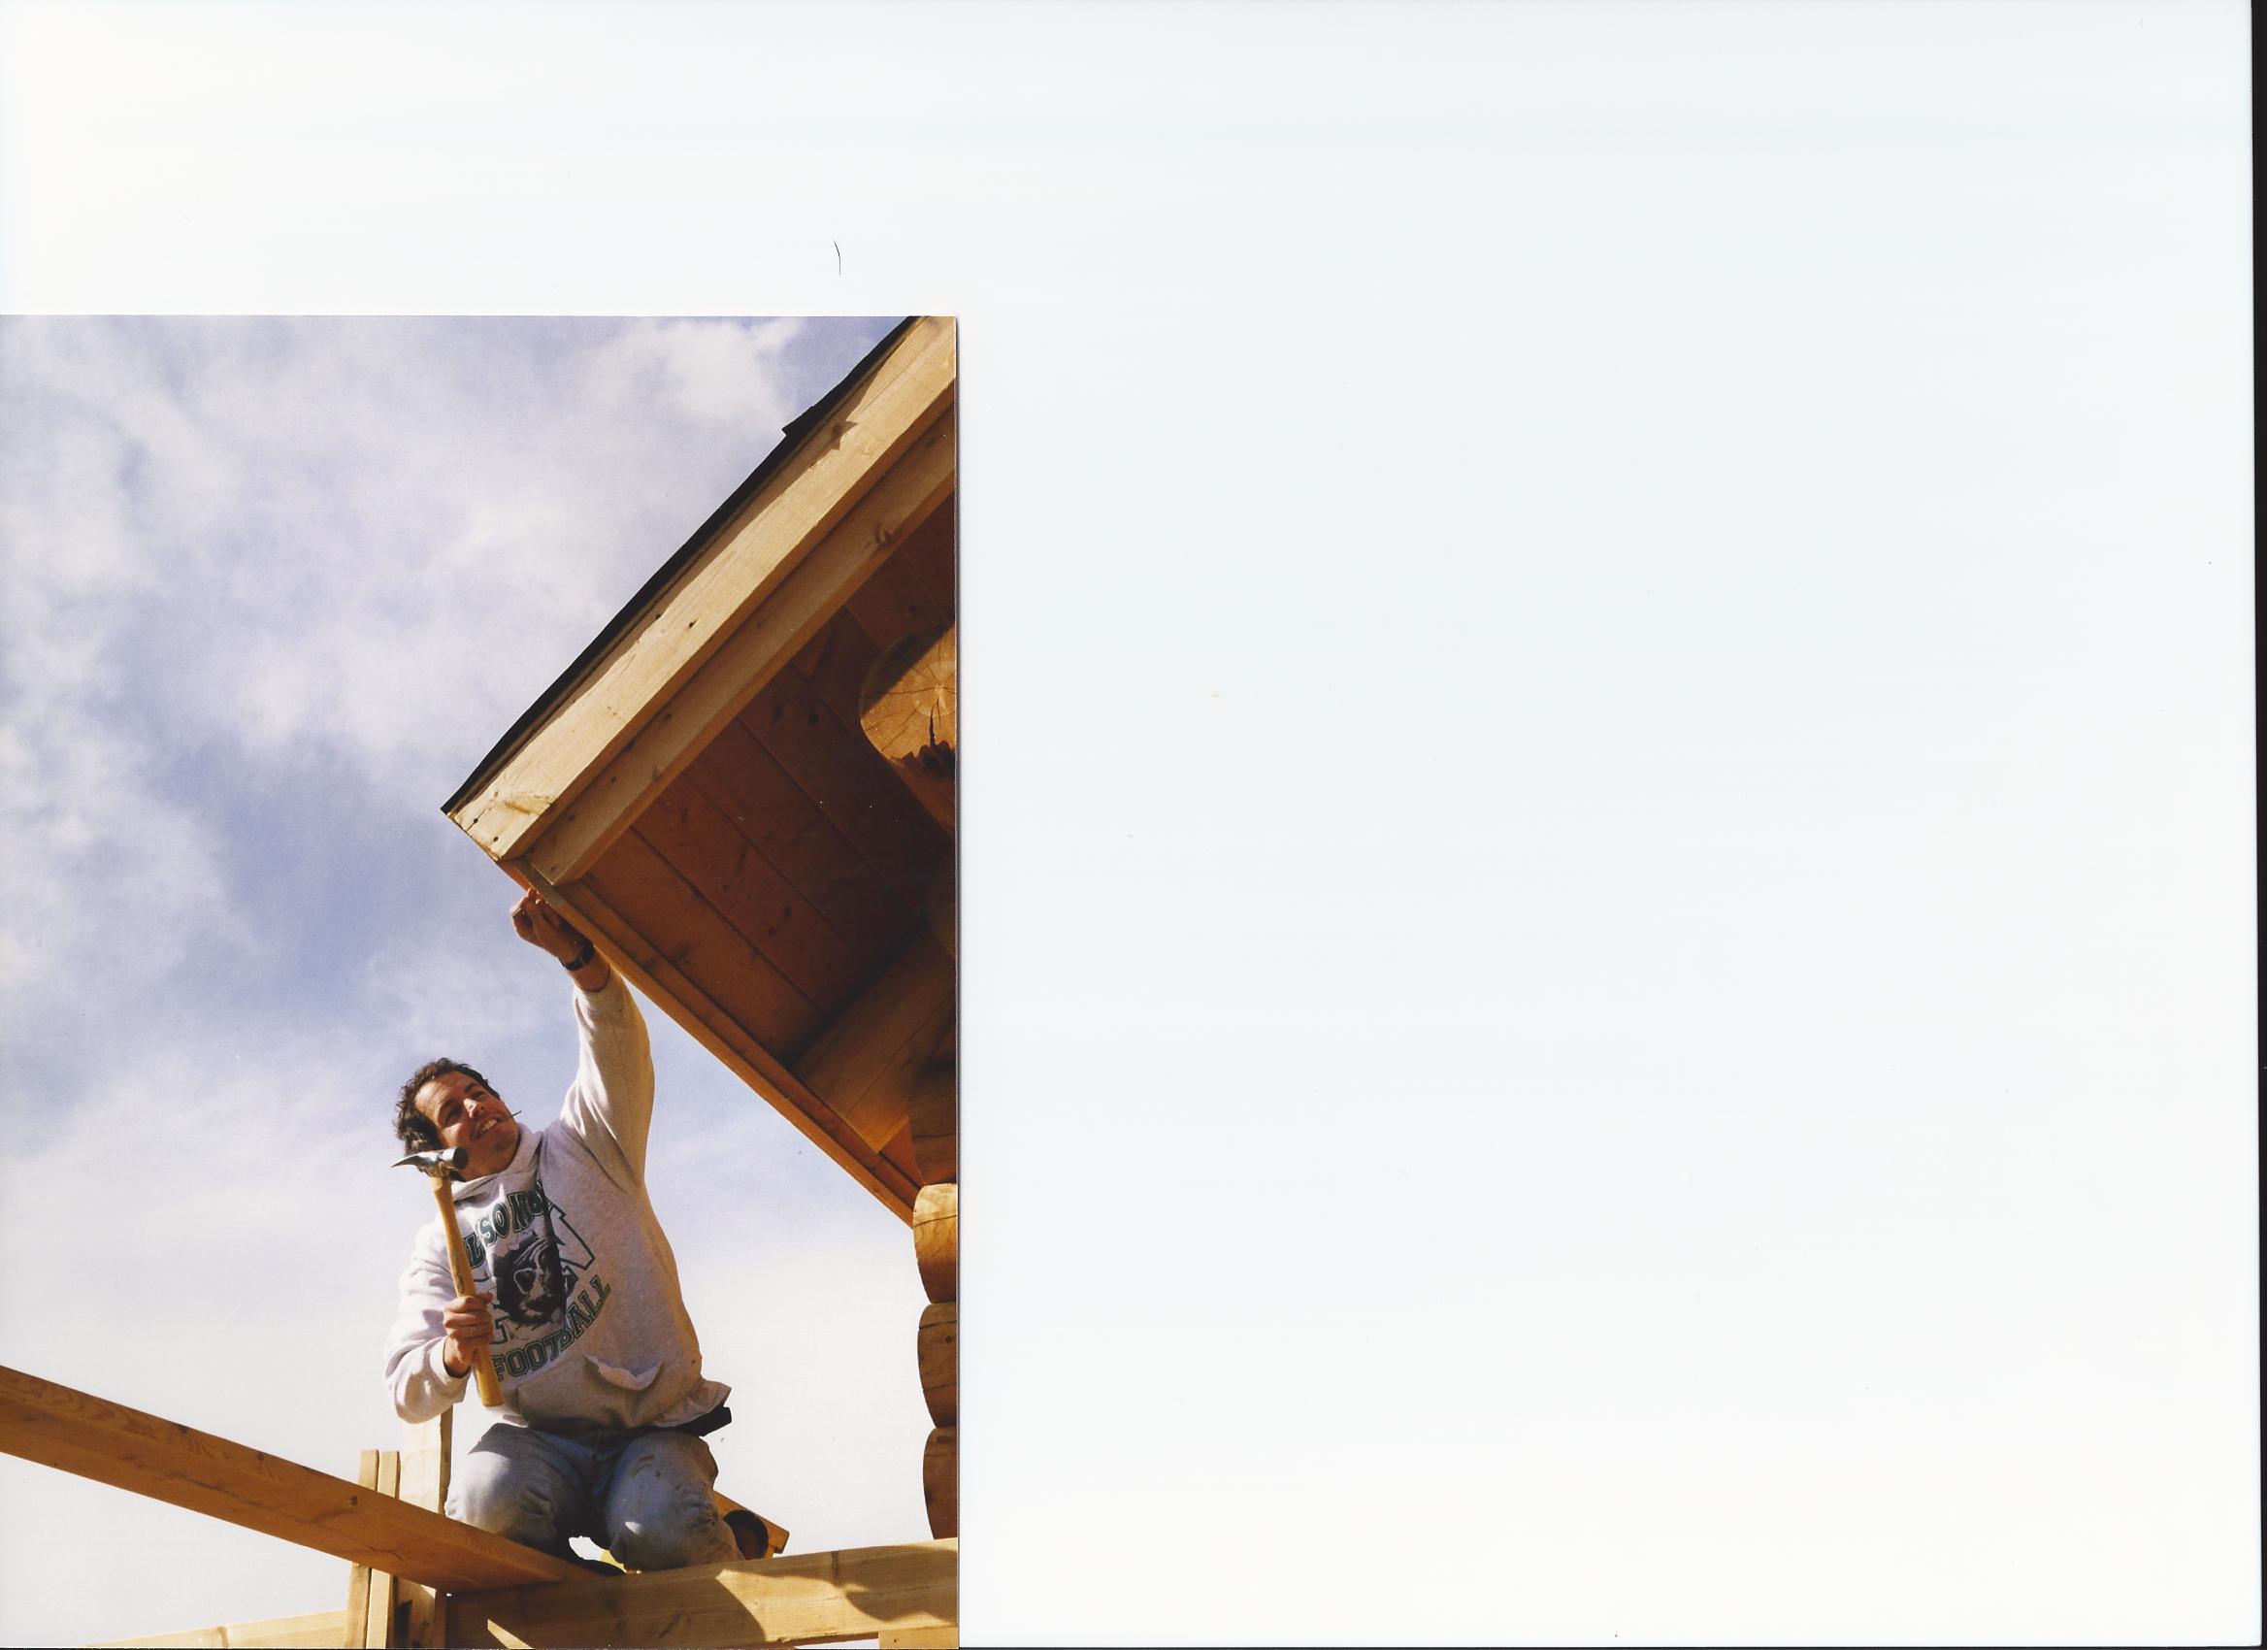 roof trim.jpg